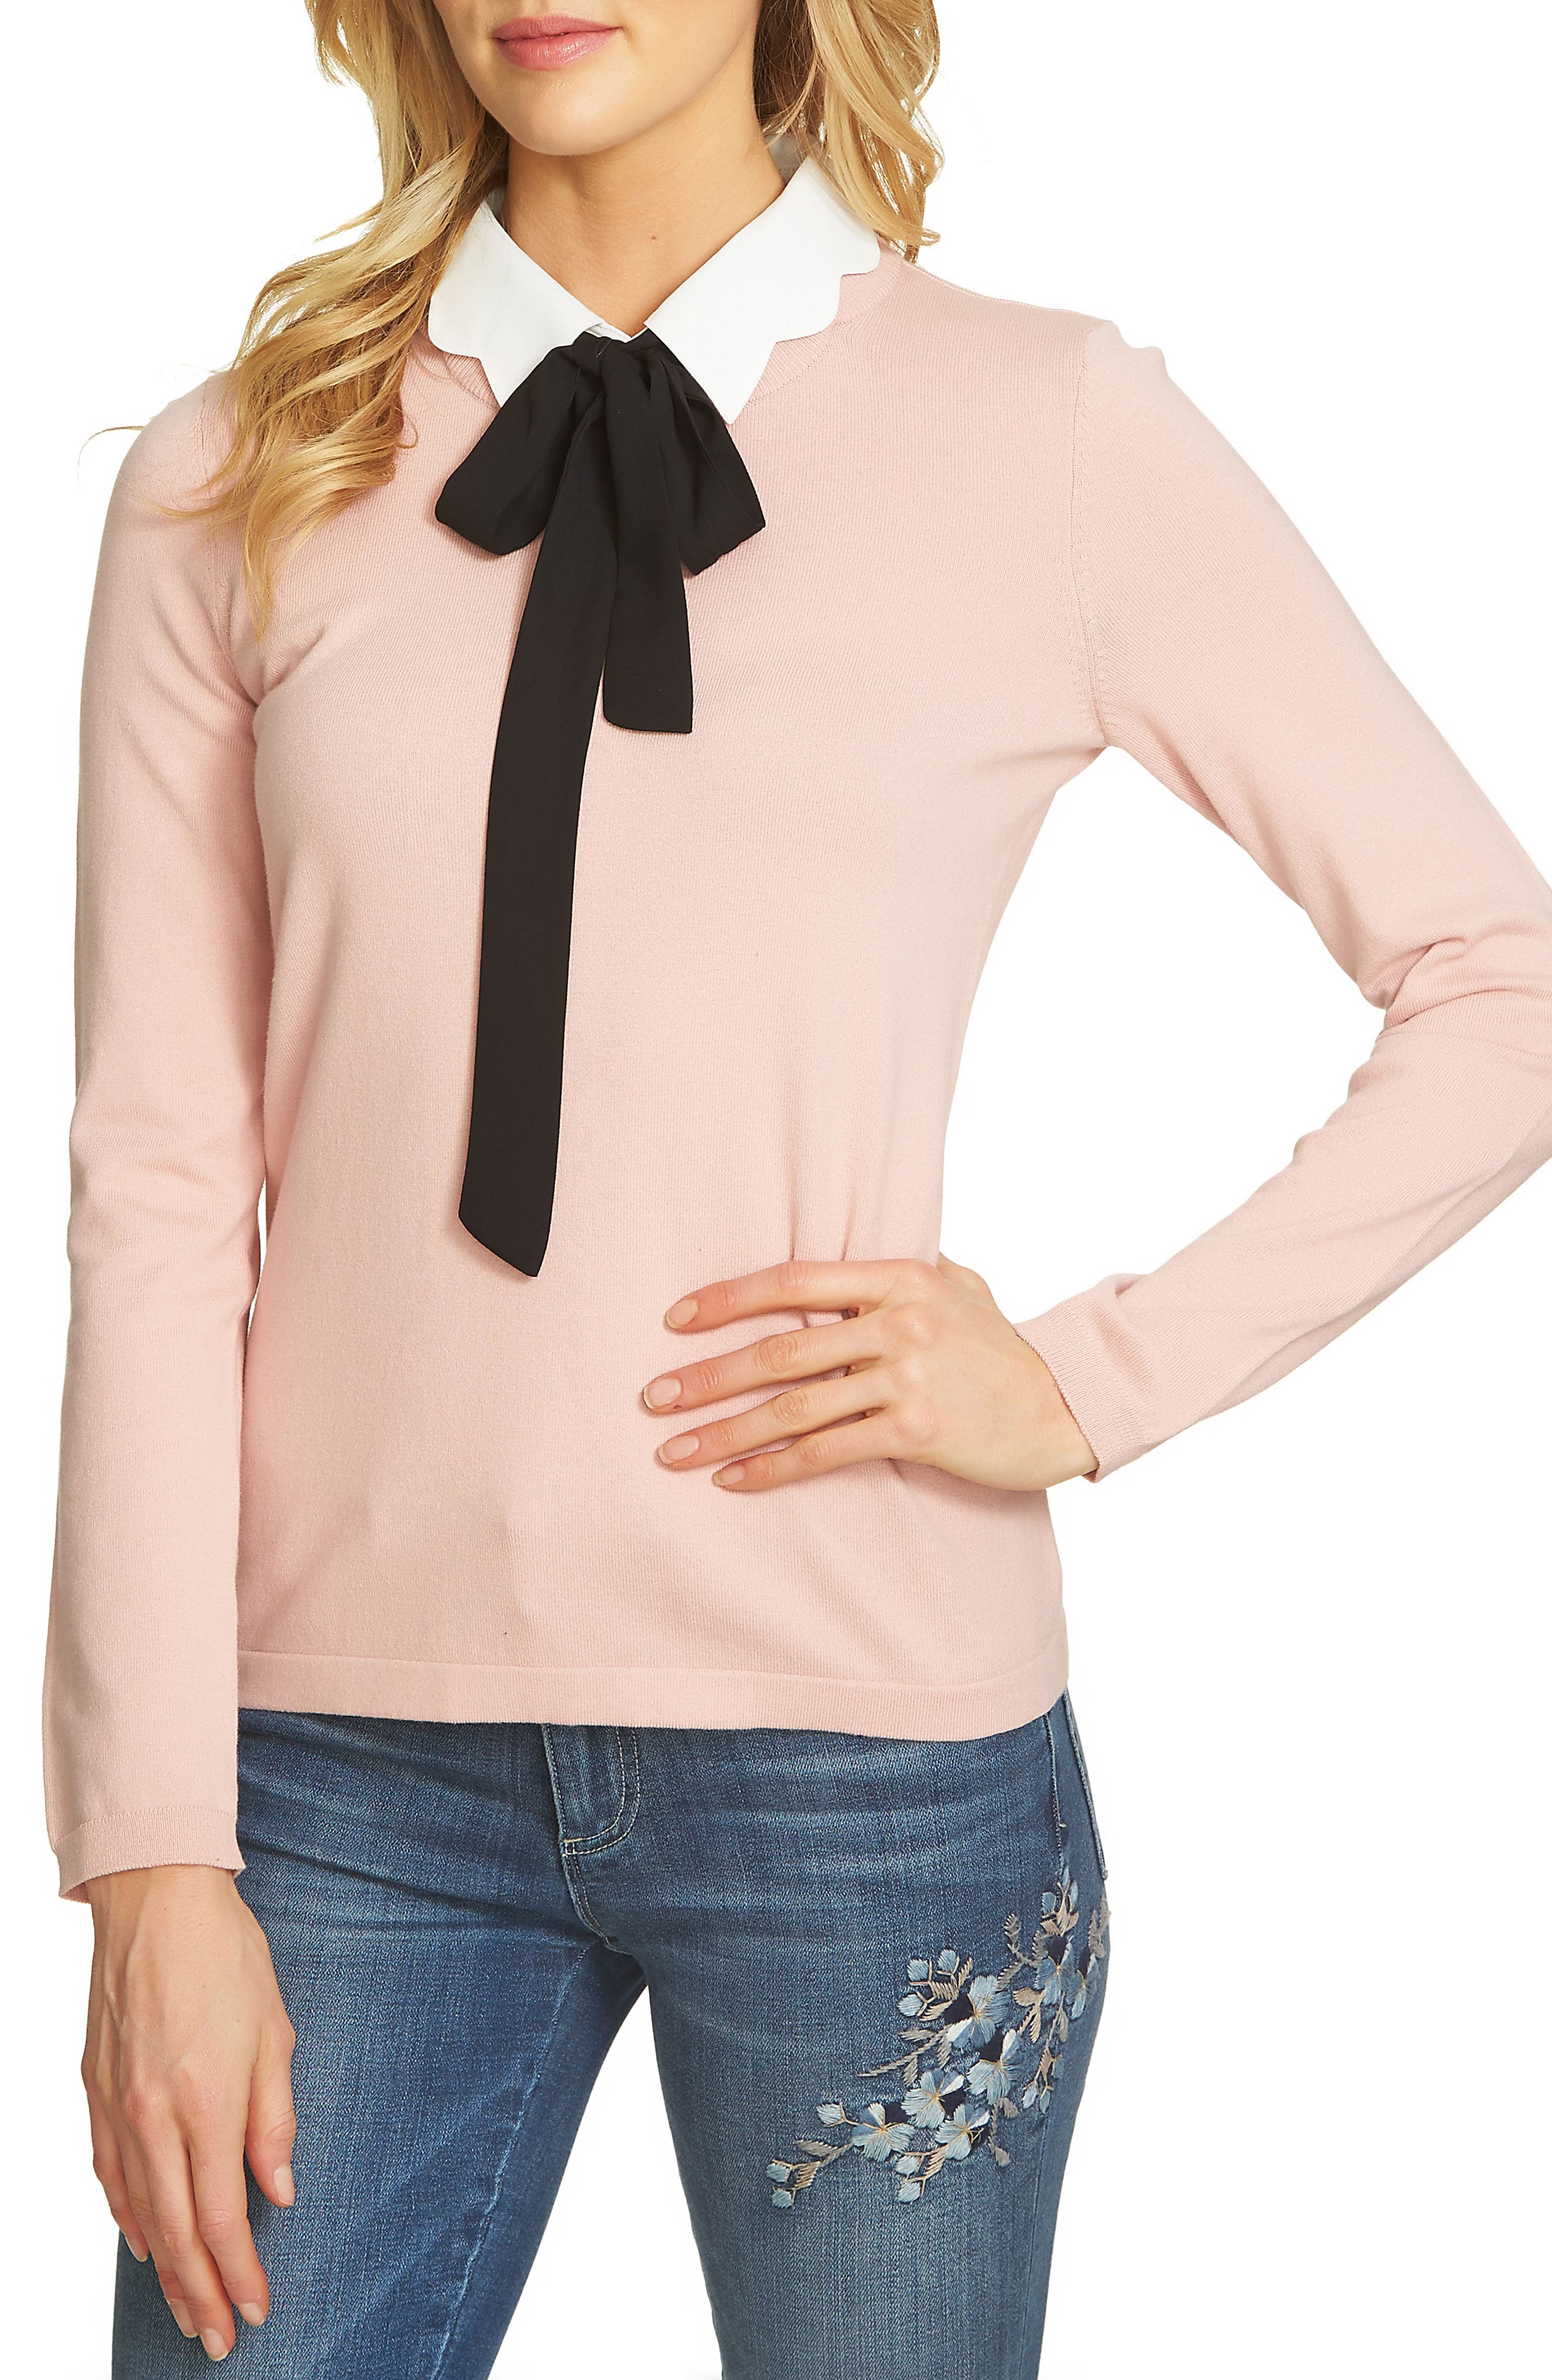 CeCe Scalloped Tie Collar Sweater